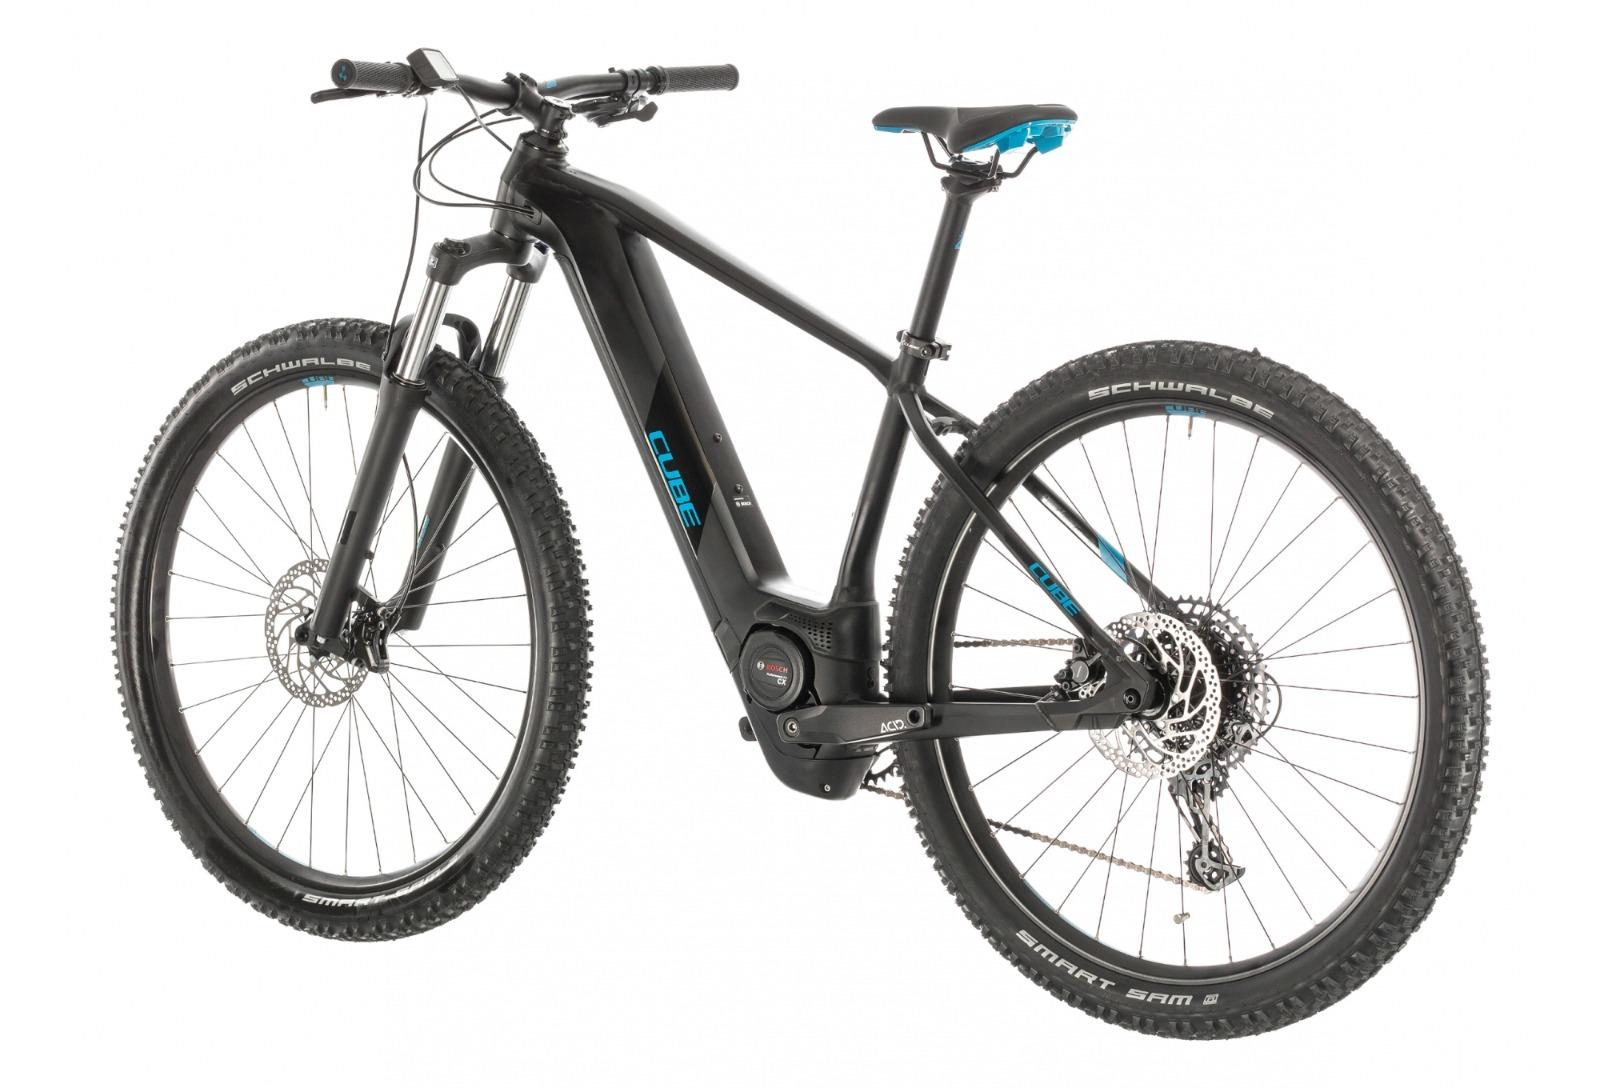 E-Mtb Reaction Hybrid EX 625 (Uomo) - Noleggio Bici Canazei